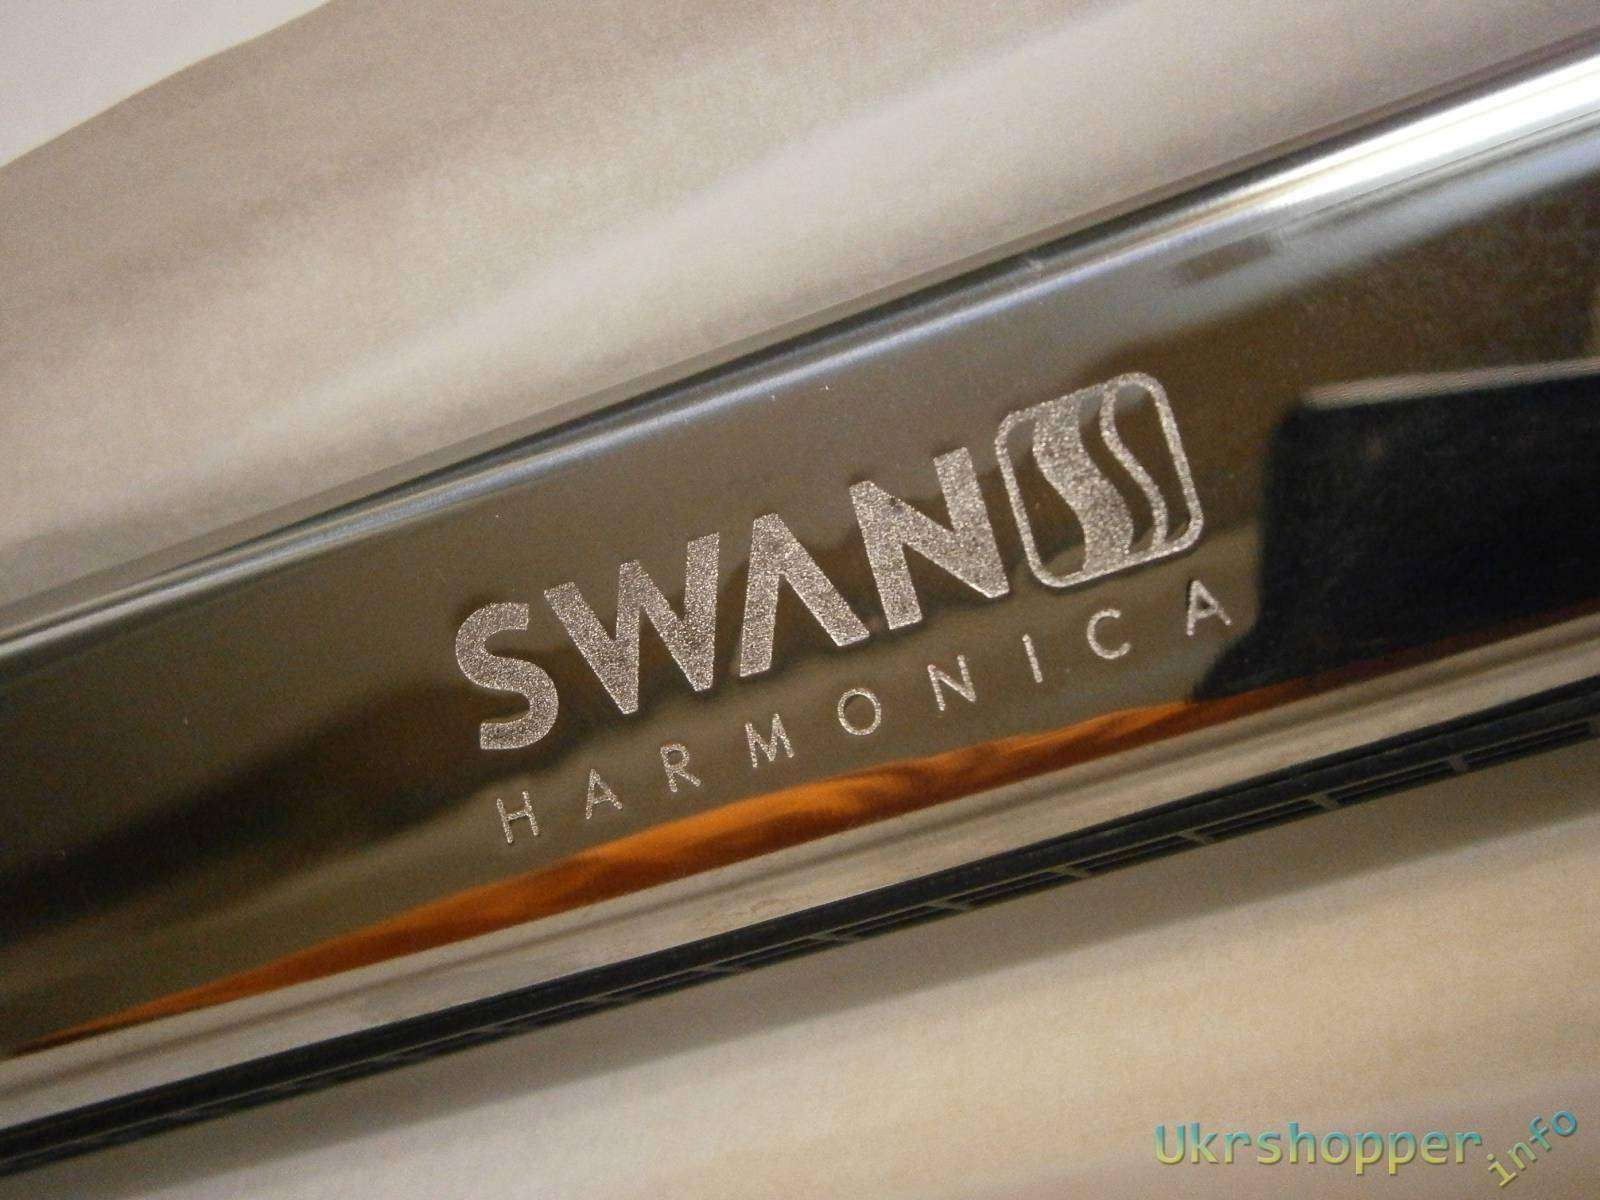 Ebay: Быстрый обзор Губной гармошки SWAN 24 Double Hole Tremolo Harmonica with key D